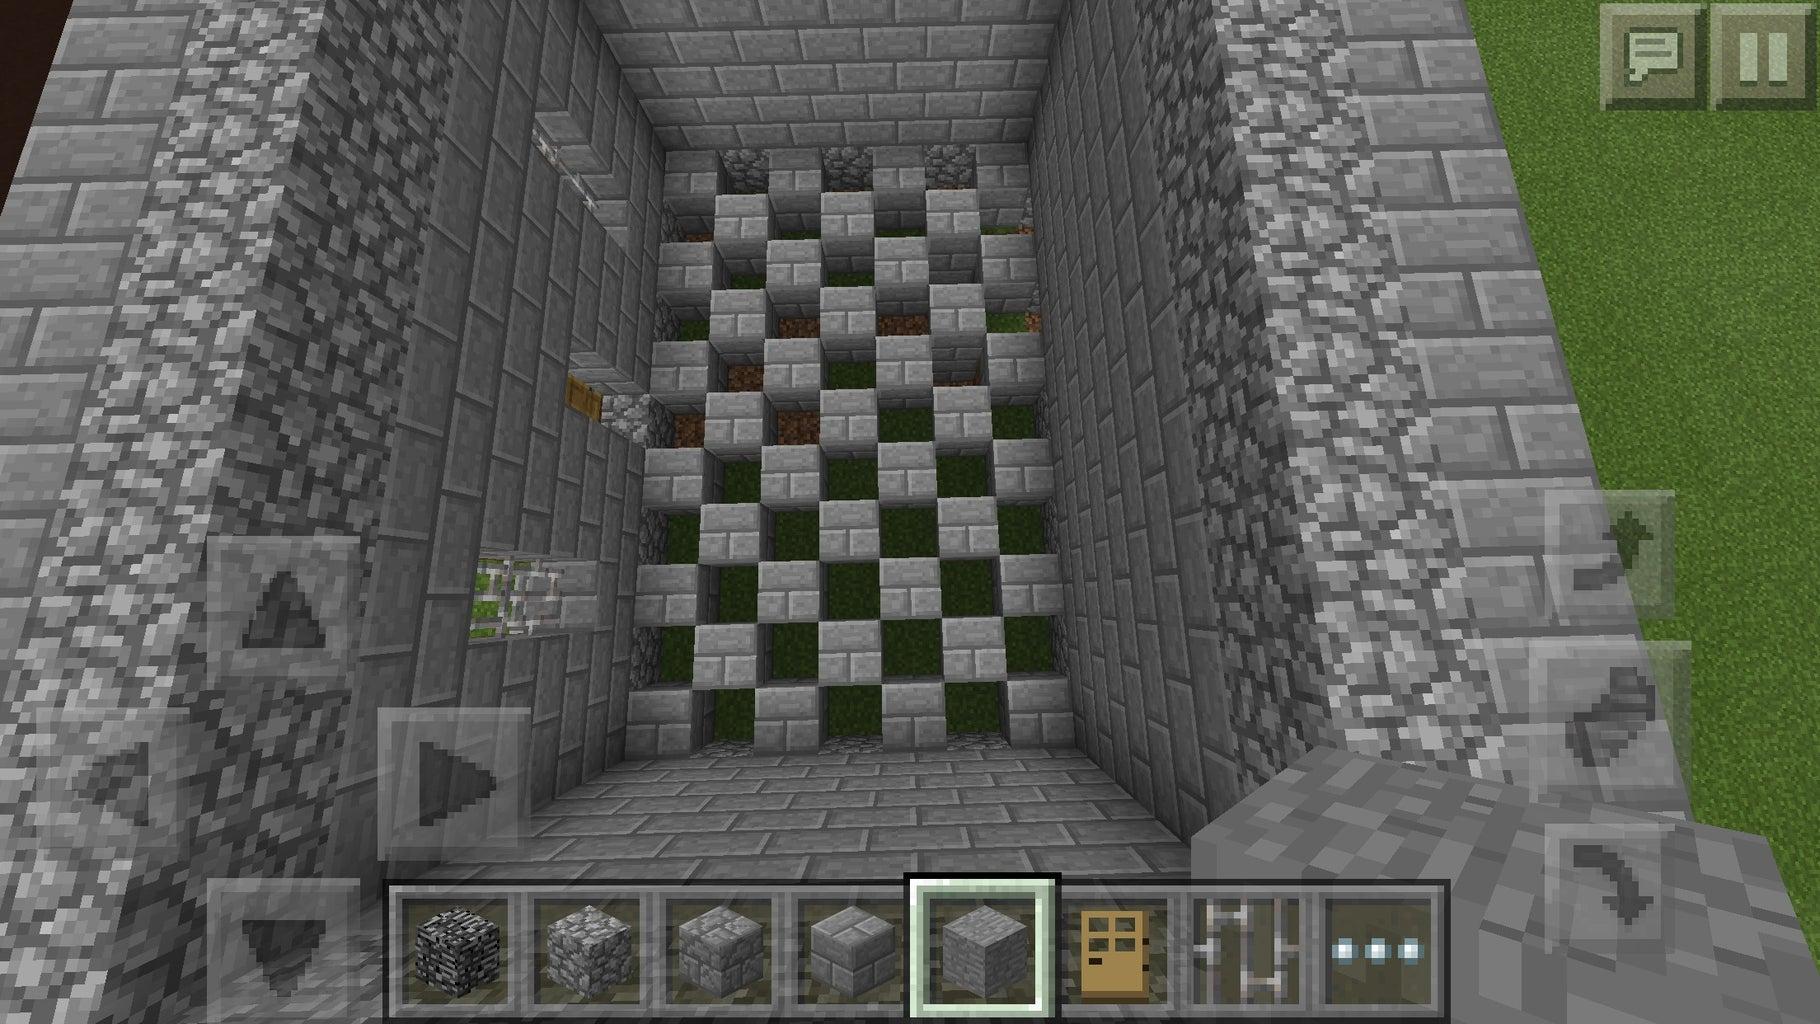 Checkered Floors!